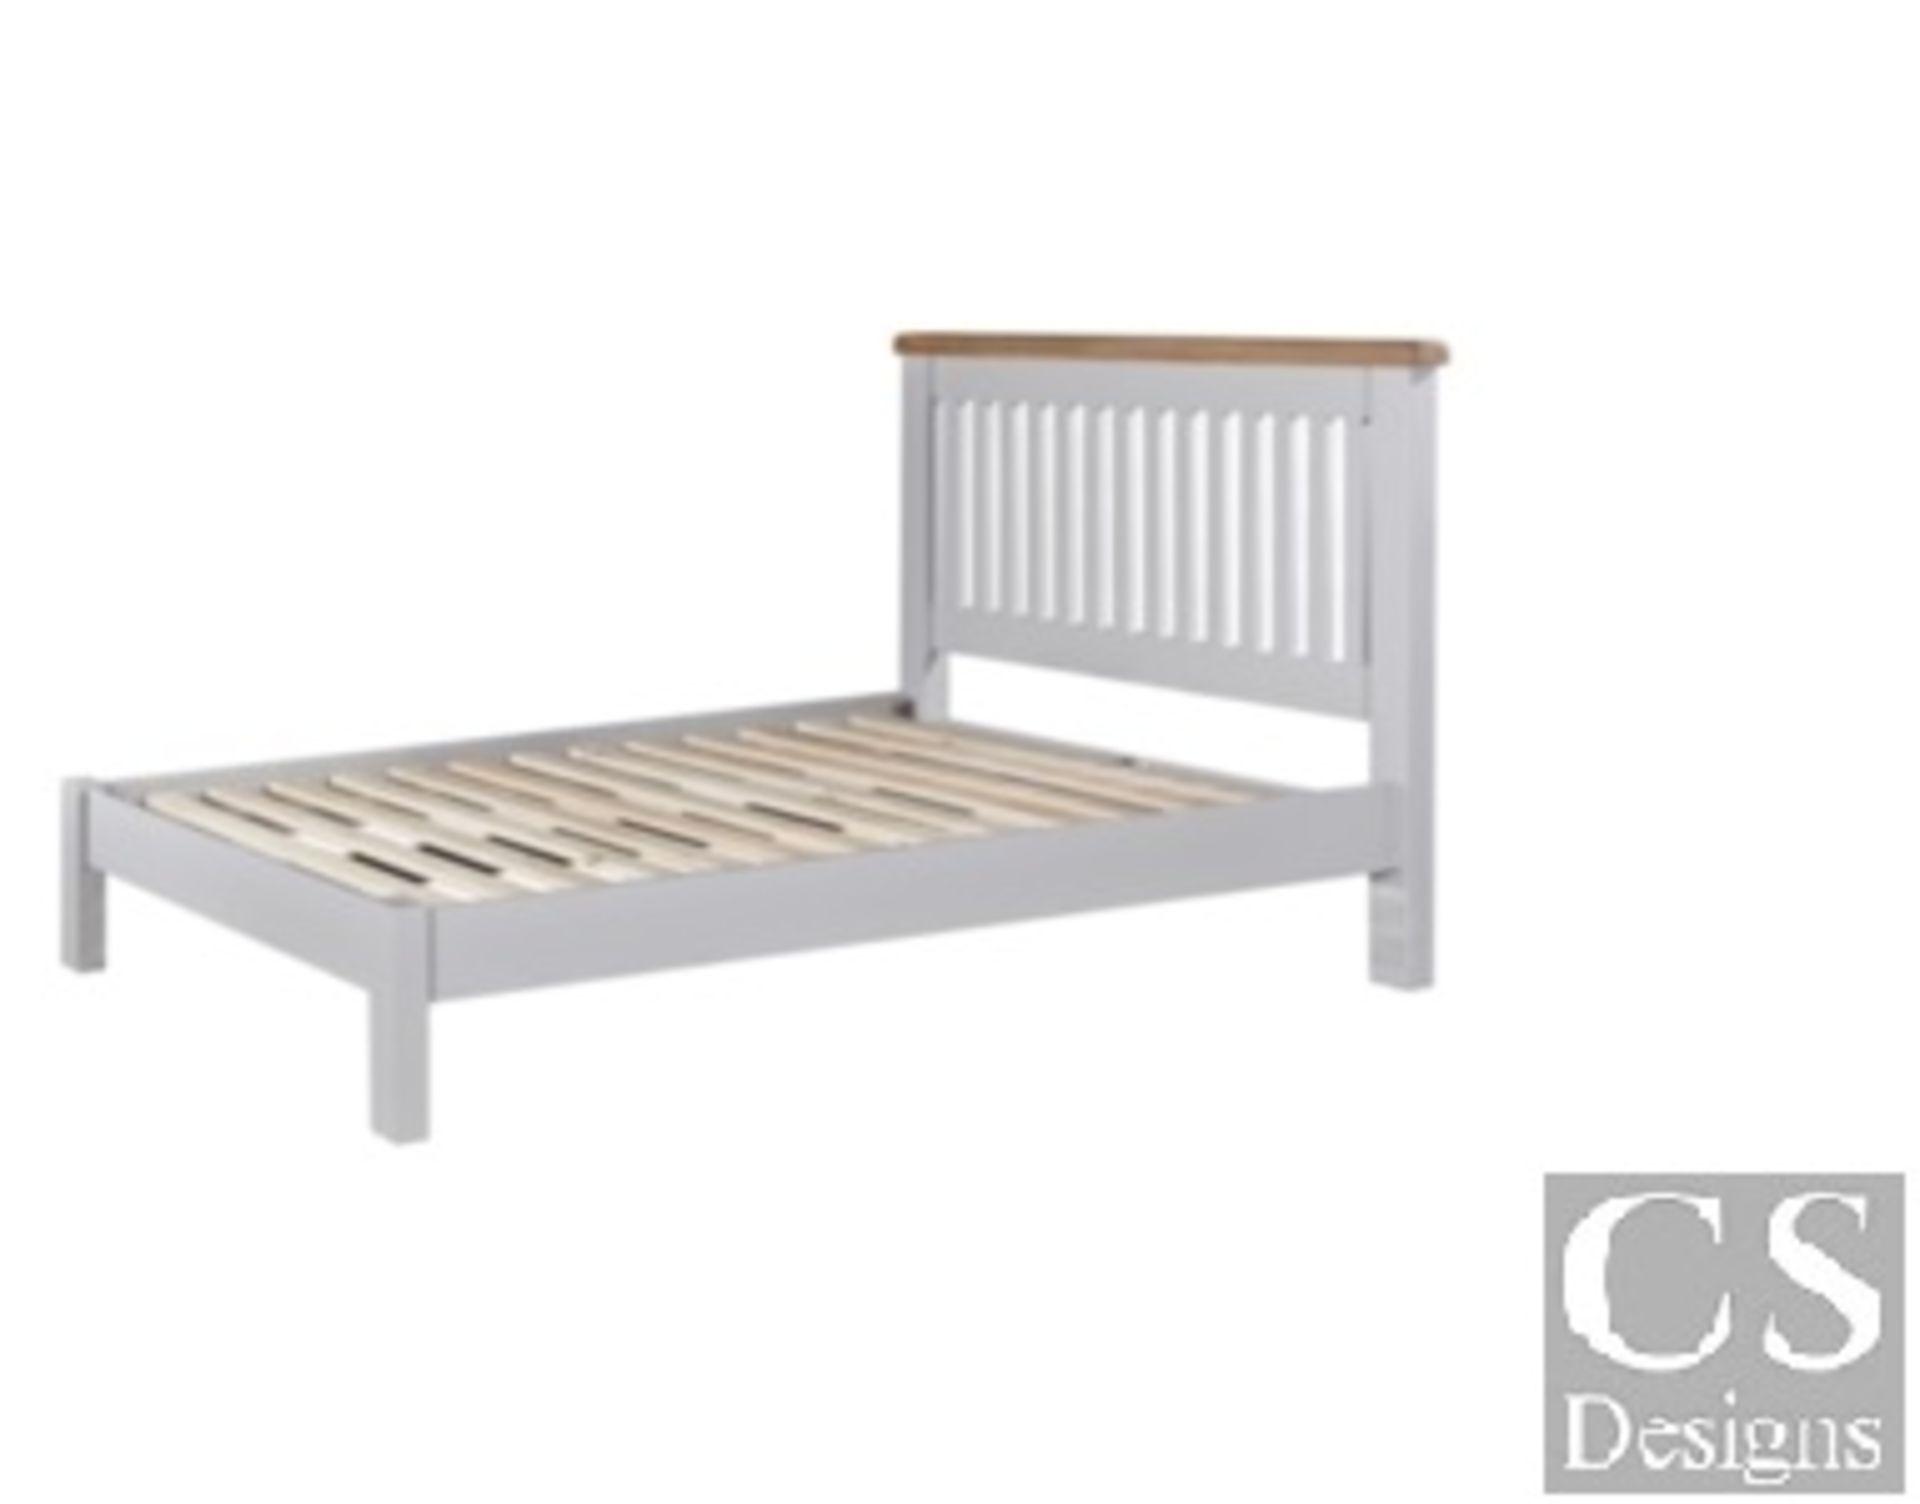 "+ VAT Brand New CS Designs ""Daylesford"" King Size Bed Frame With Natural Oak & Solid Hardwood - Image 3 of 3"